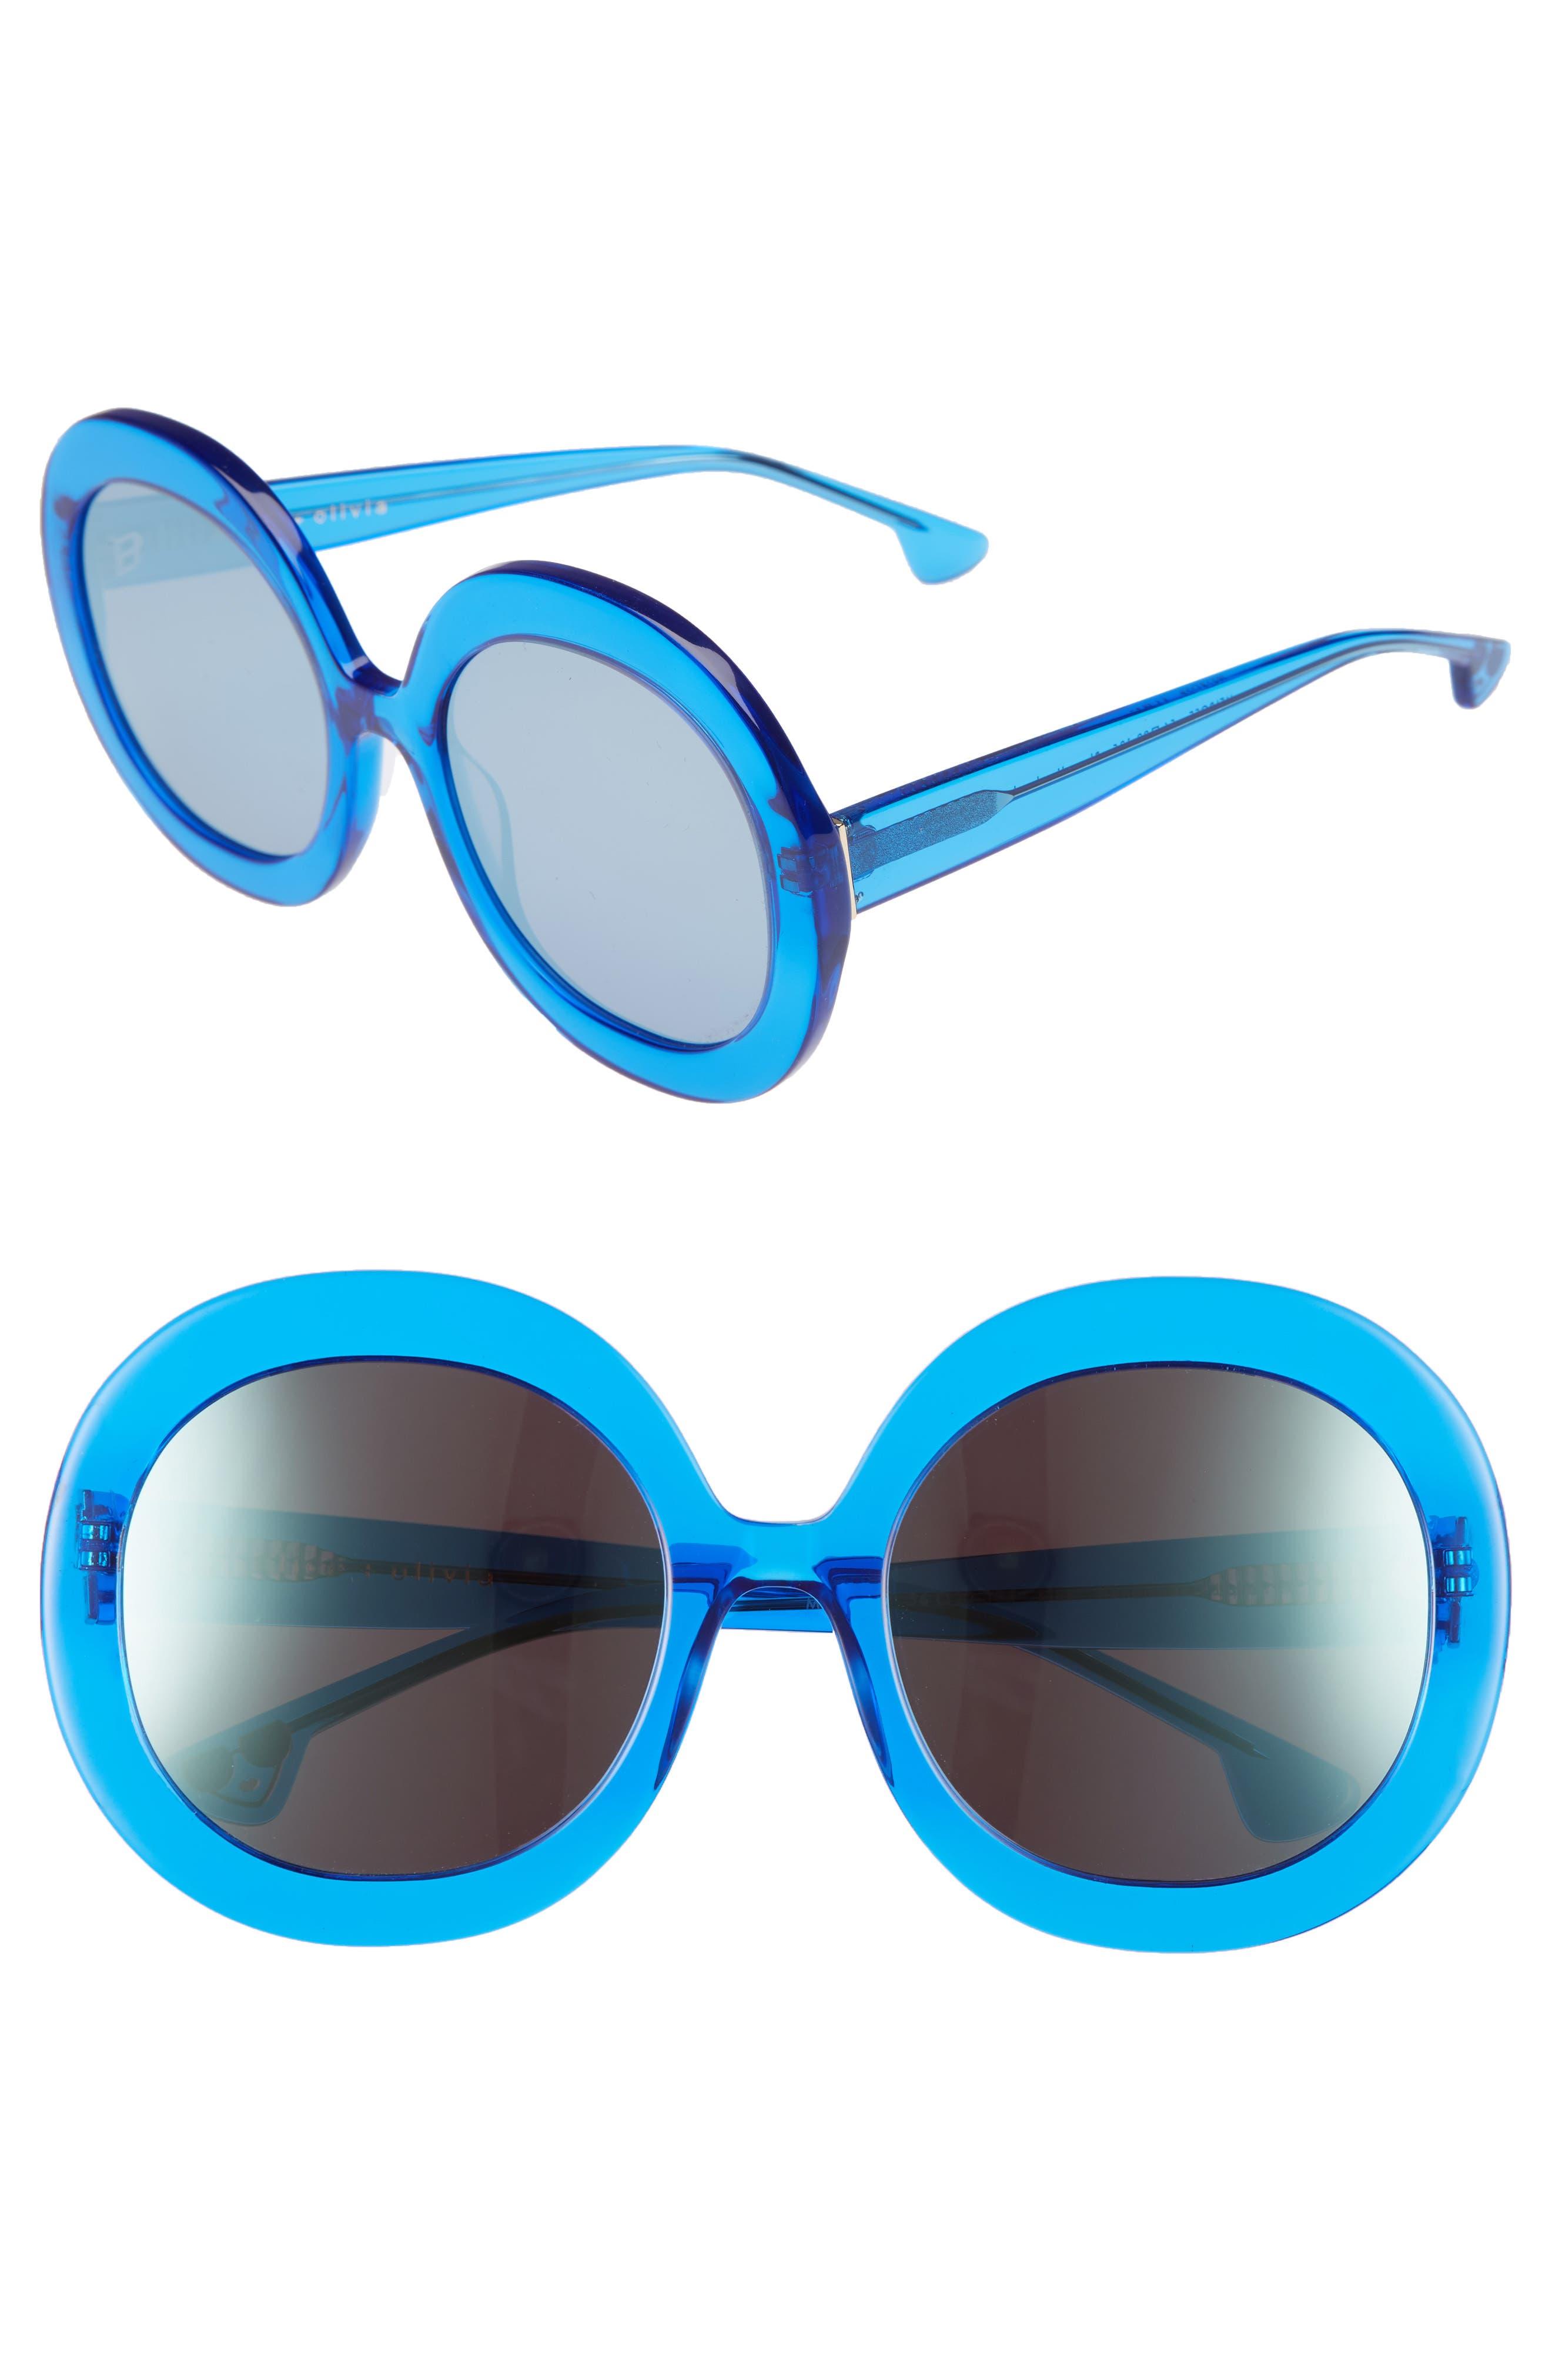 Main Image - Alice + Olivia Melrose 56mm Round Sunglasses